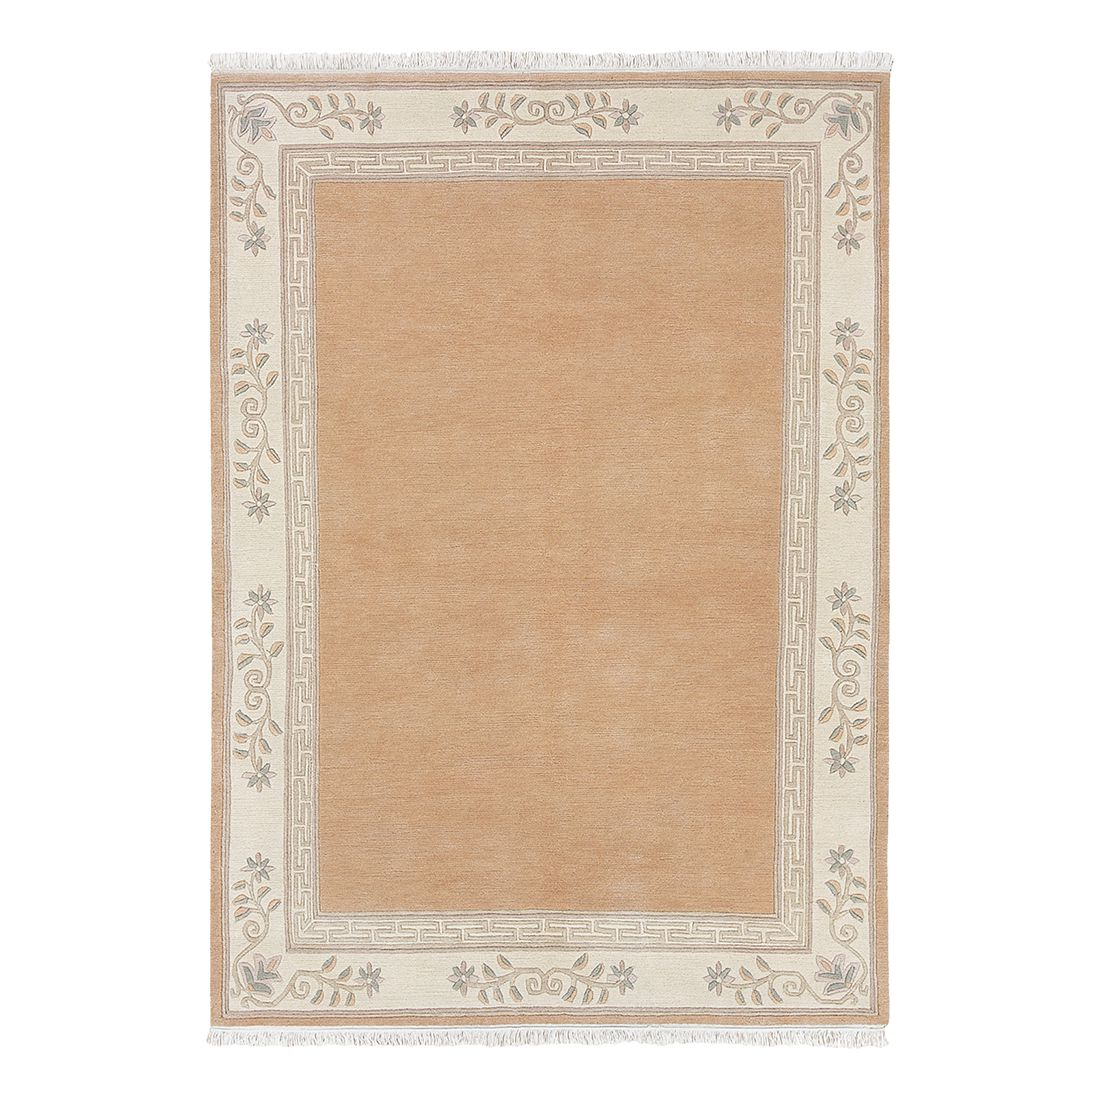 Teppich Floral - Apricot - 170 x 240 cm, Luxor living